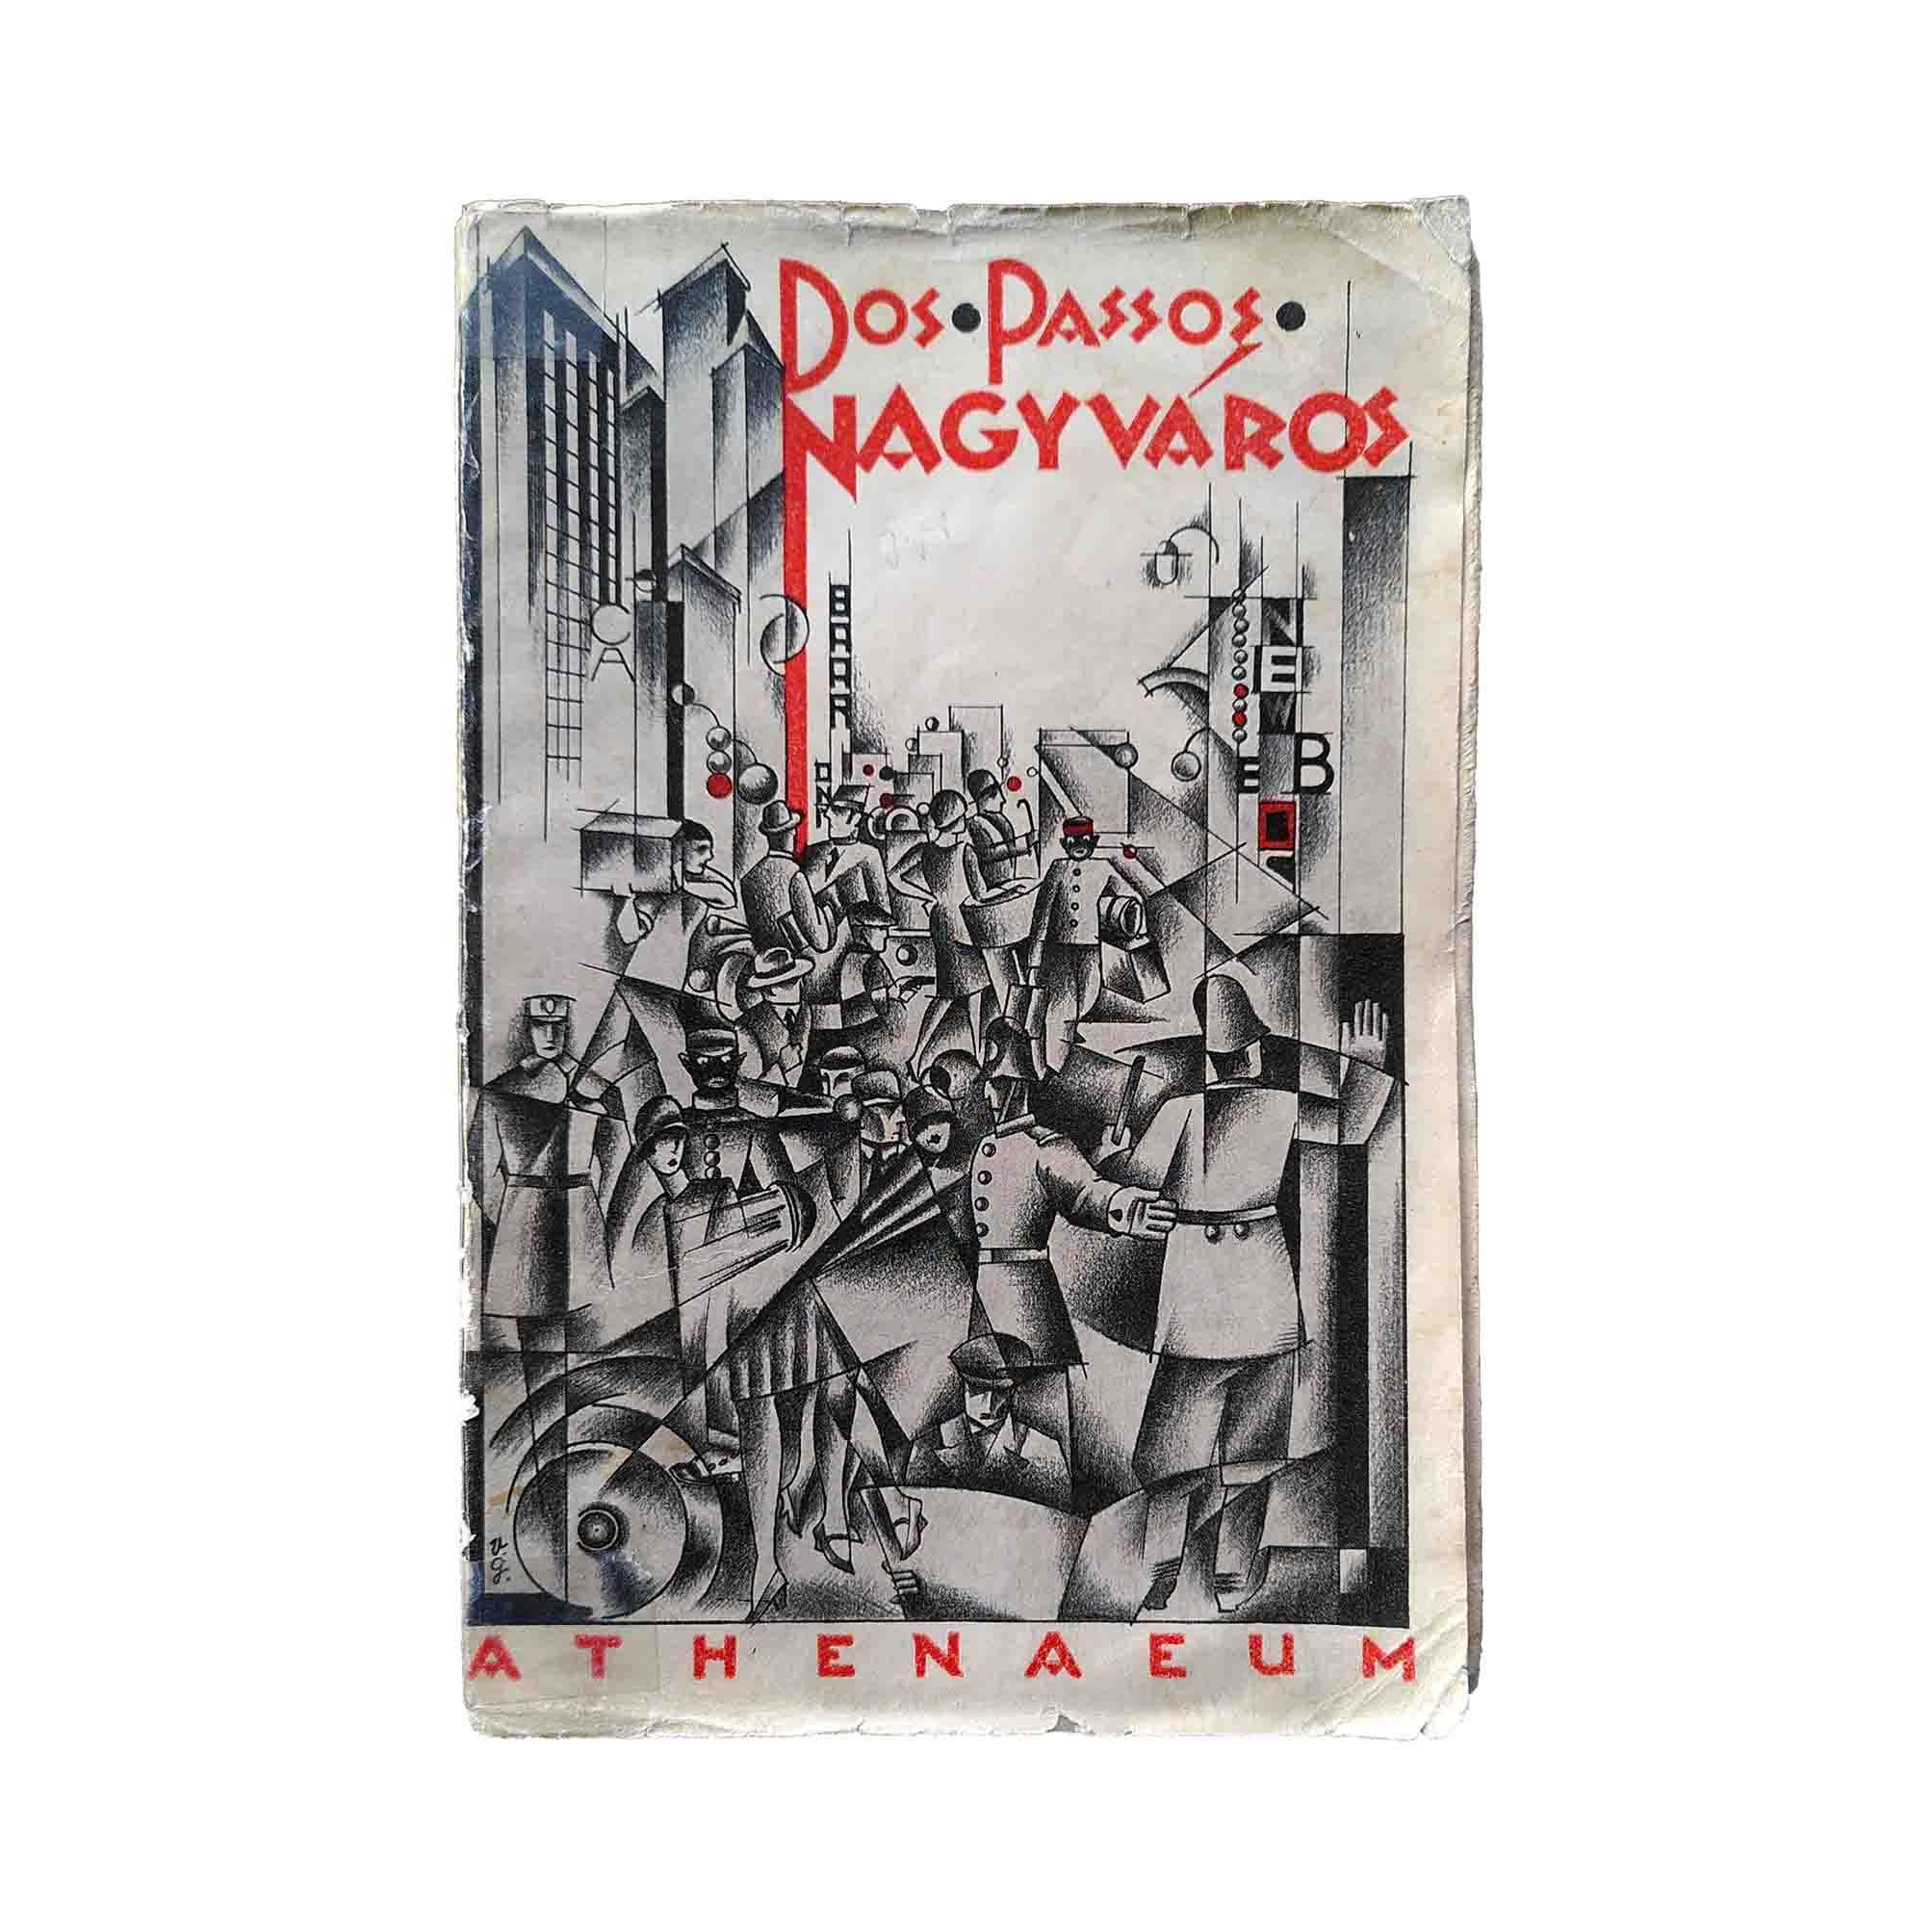 1142-Dos-Passos-Vegh-Manhattan-1928-Cover-recto-1-free-N.jpg